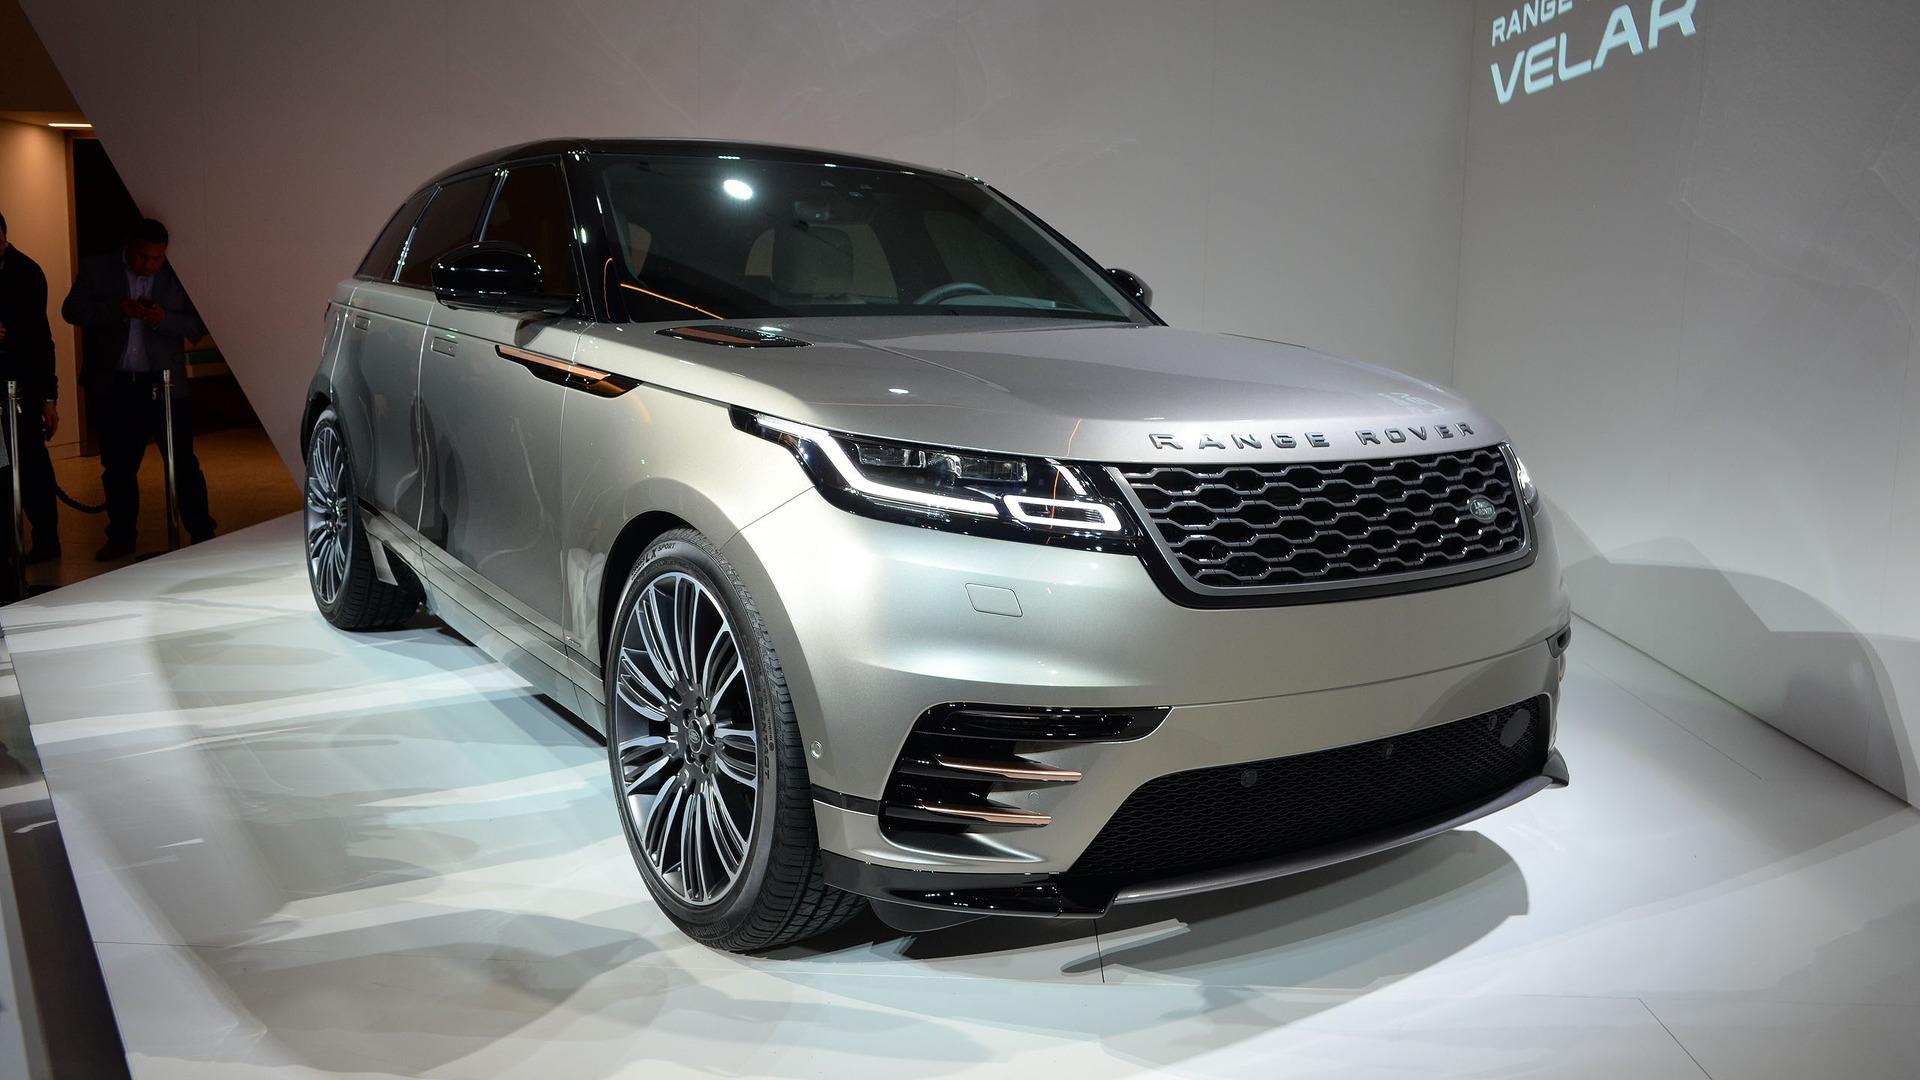 Range Rover Velar And 2018 Jaguar F Type To Debut In New York